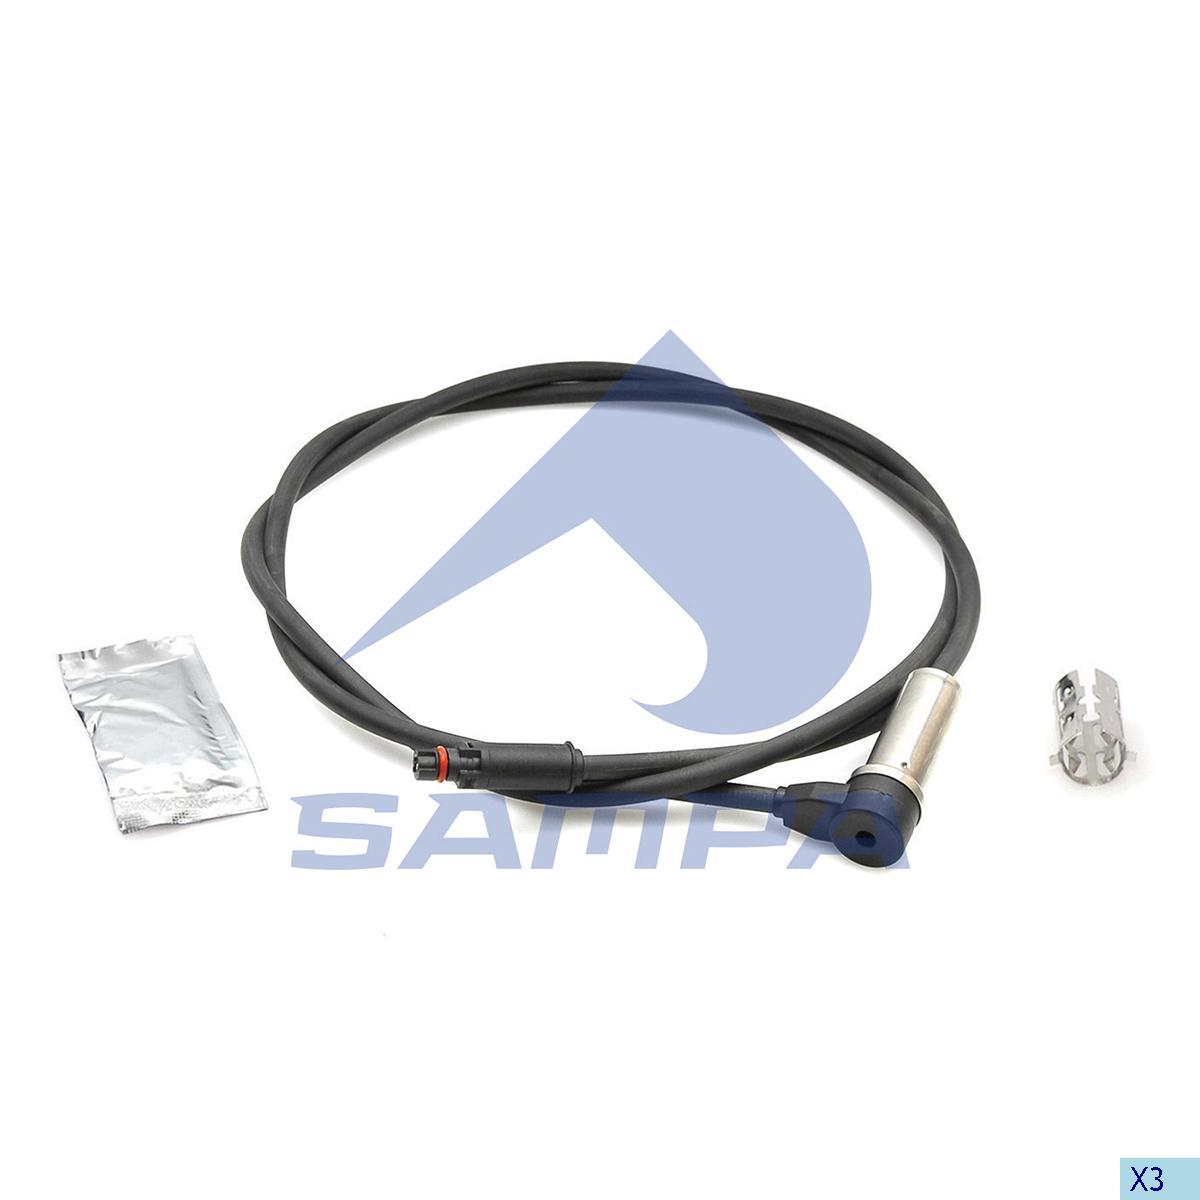 Sensor, ABS, Iveco, Brake